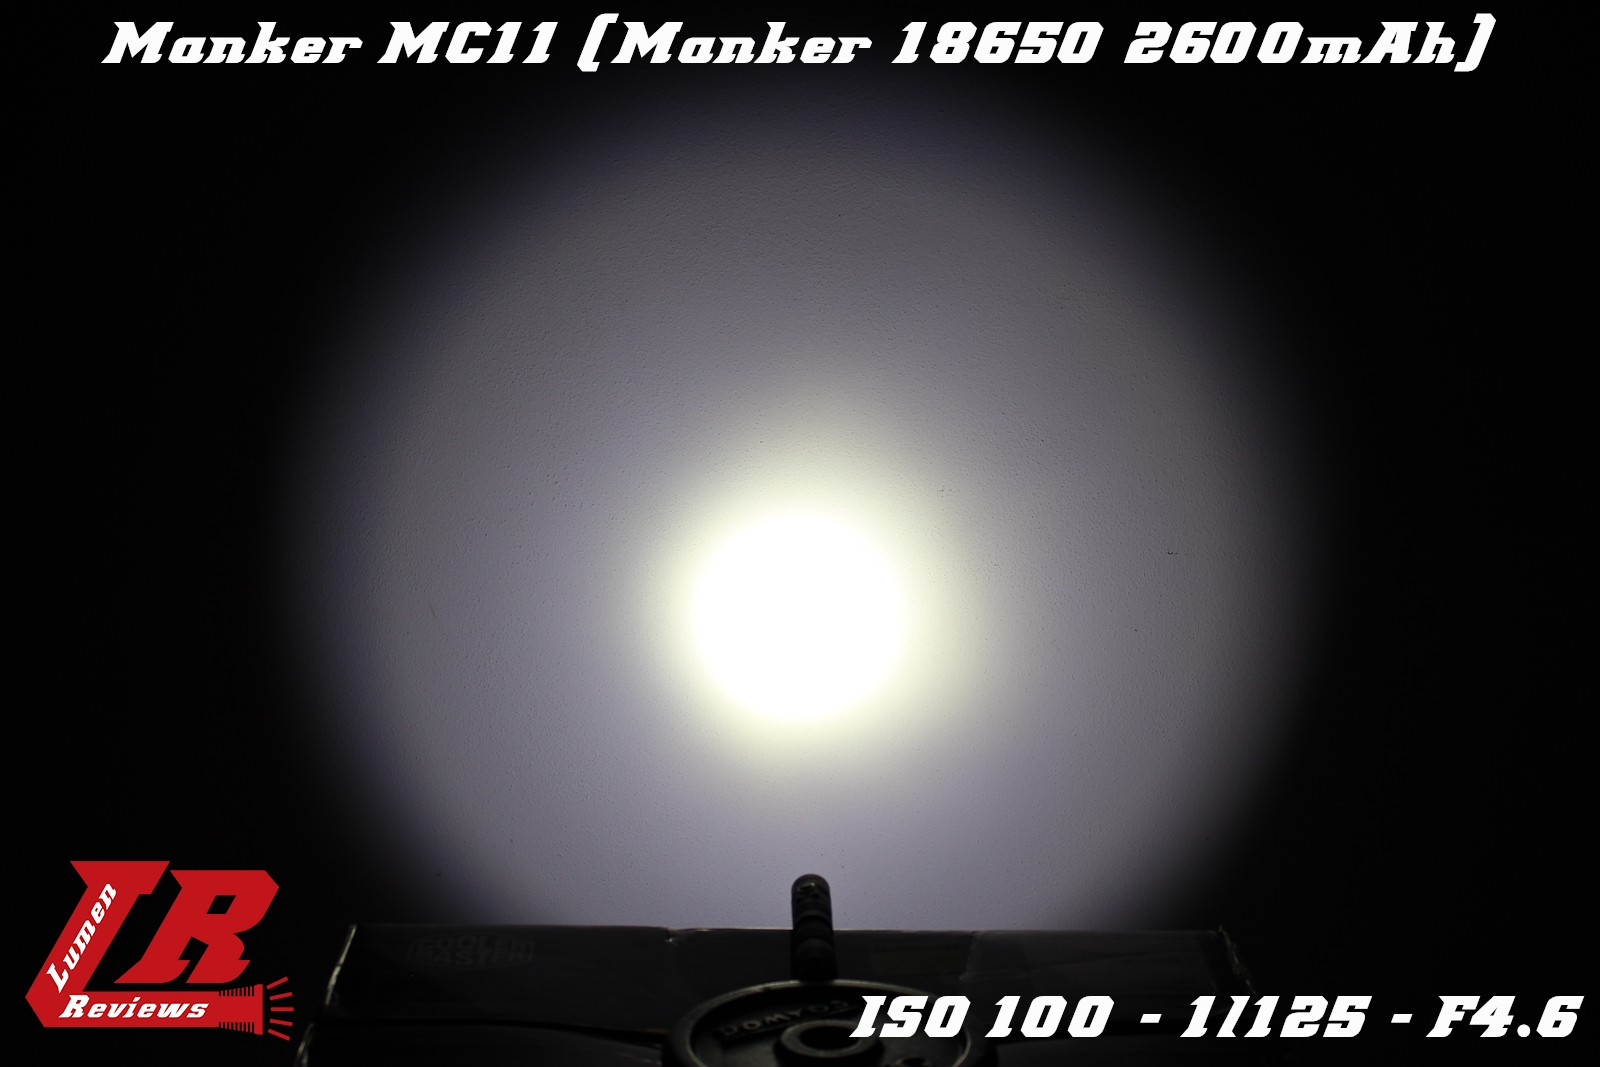 Manker MC11 BS 3